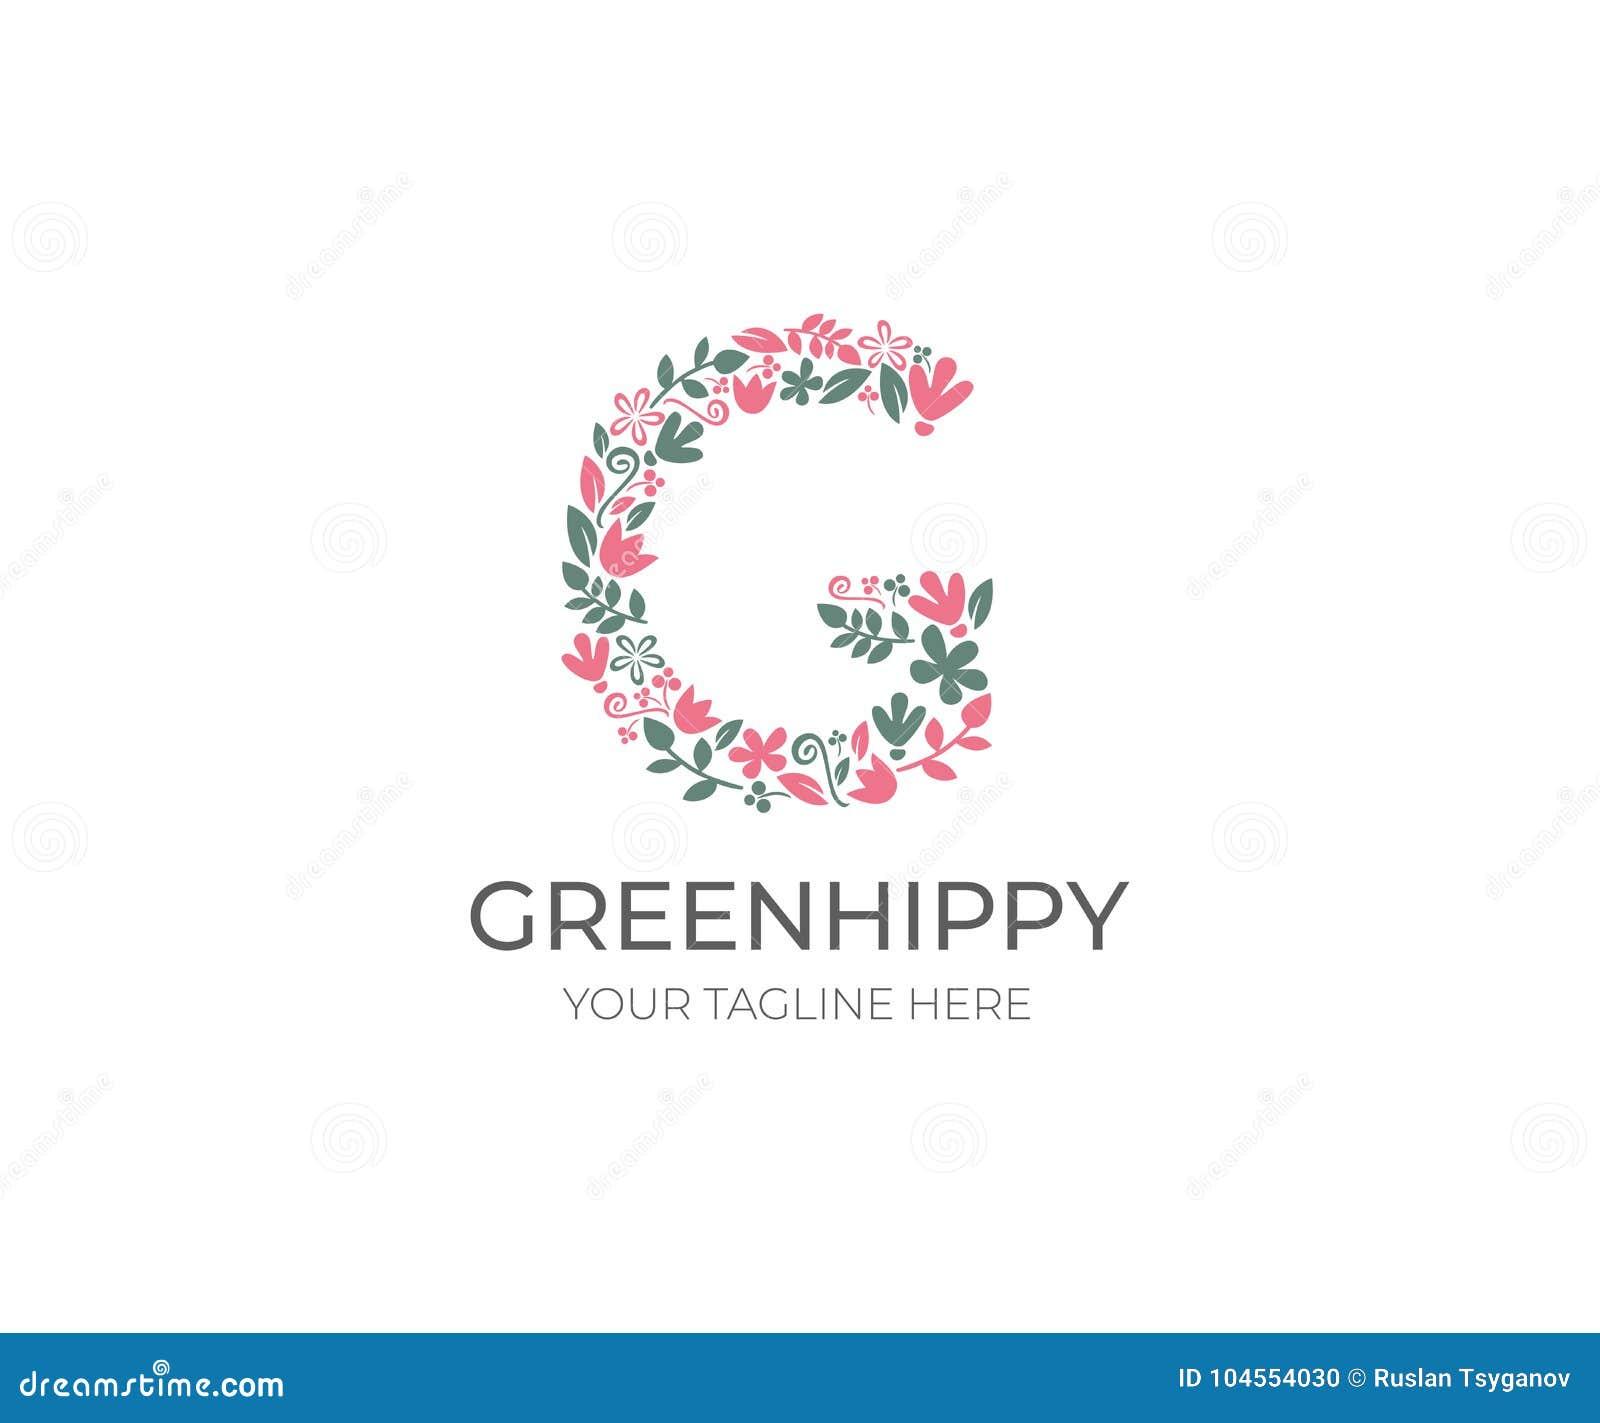 Floral letter g logo template nature vector design stock vector floral letter g logo template nature vector design maxwellsz